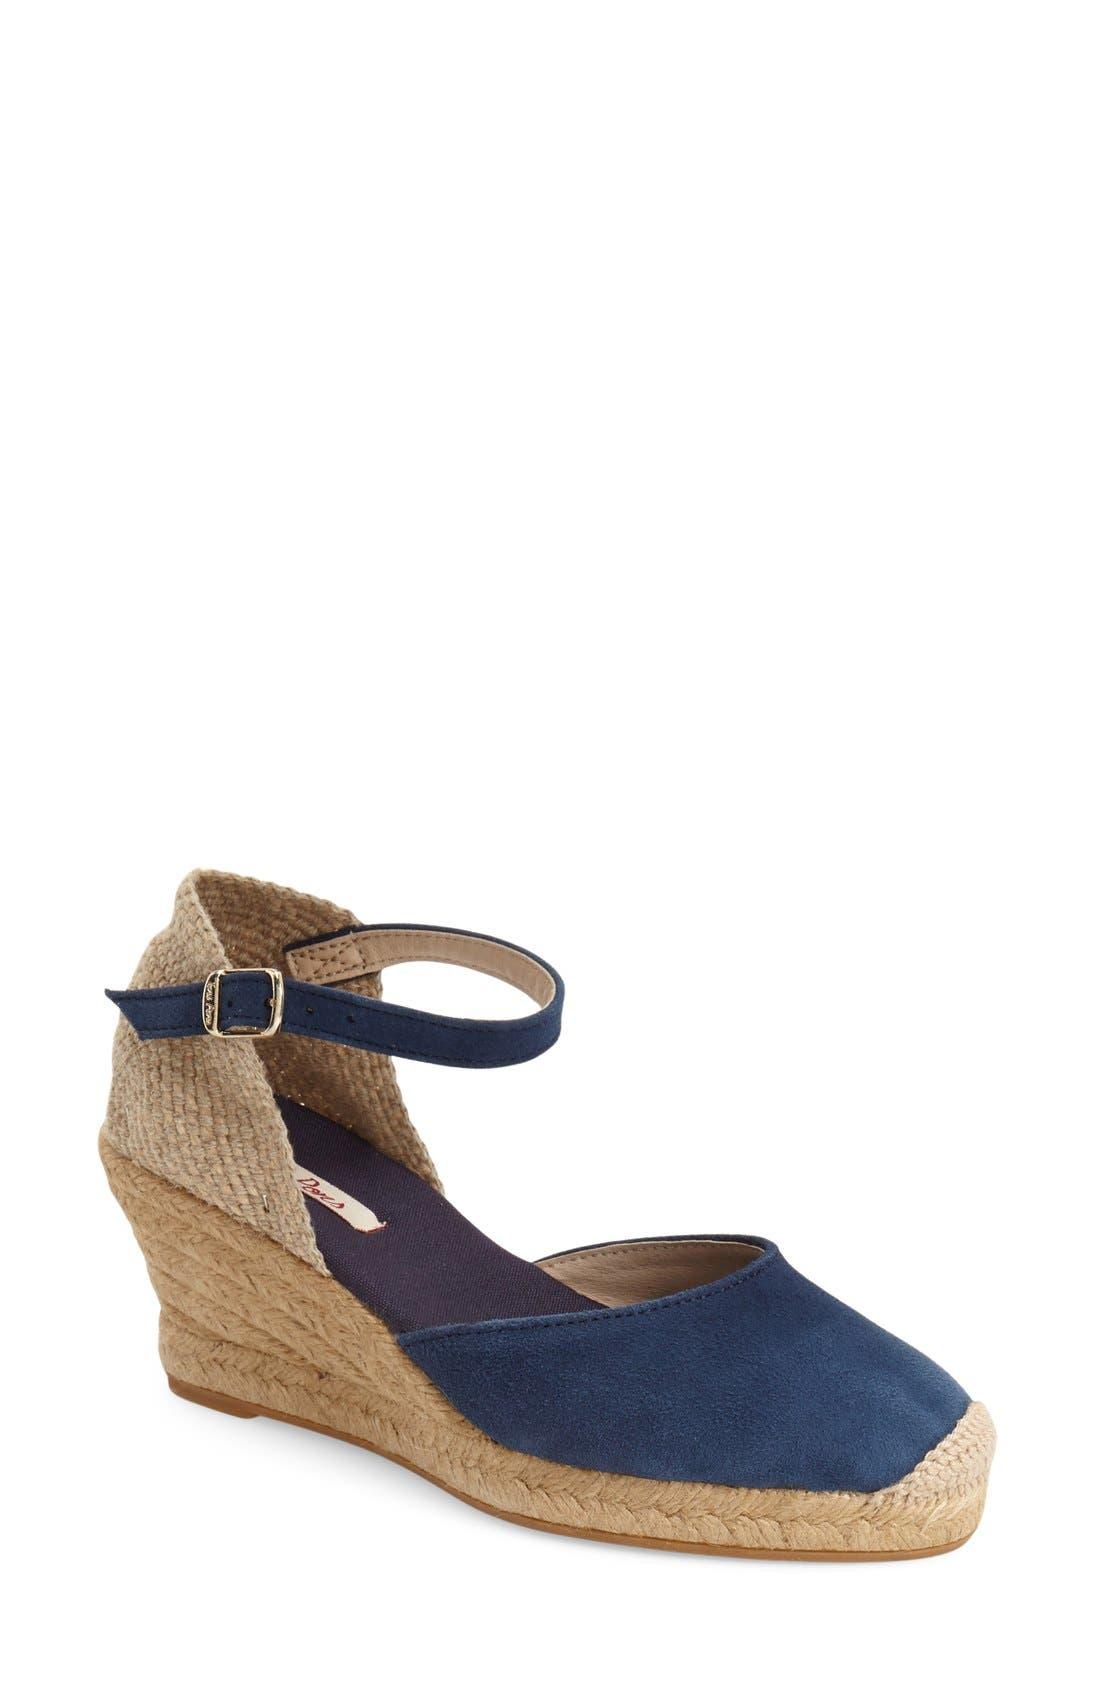 Alternate Image 1 Selected - Toni Pons 'Lloret-5' Espadrille Wedge Sandal (Women)